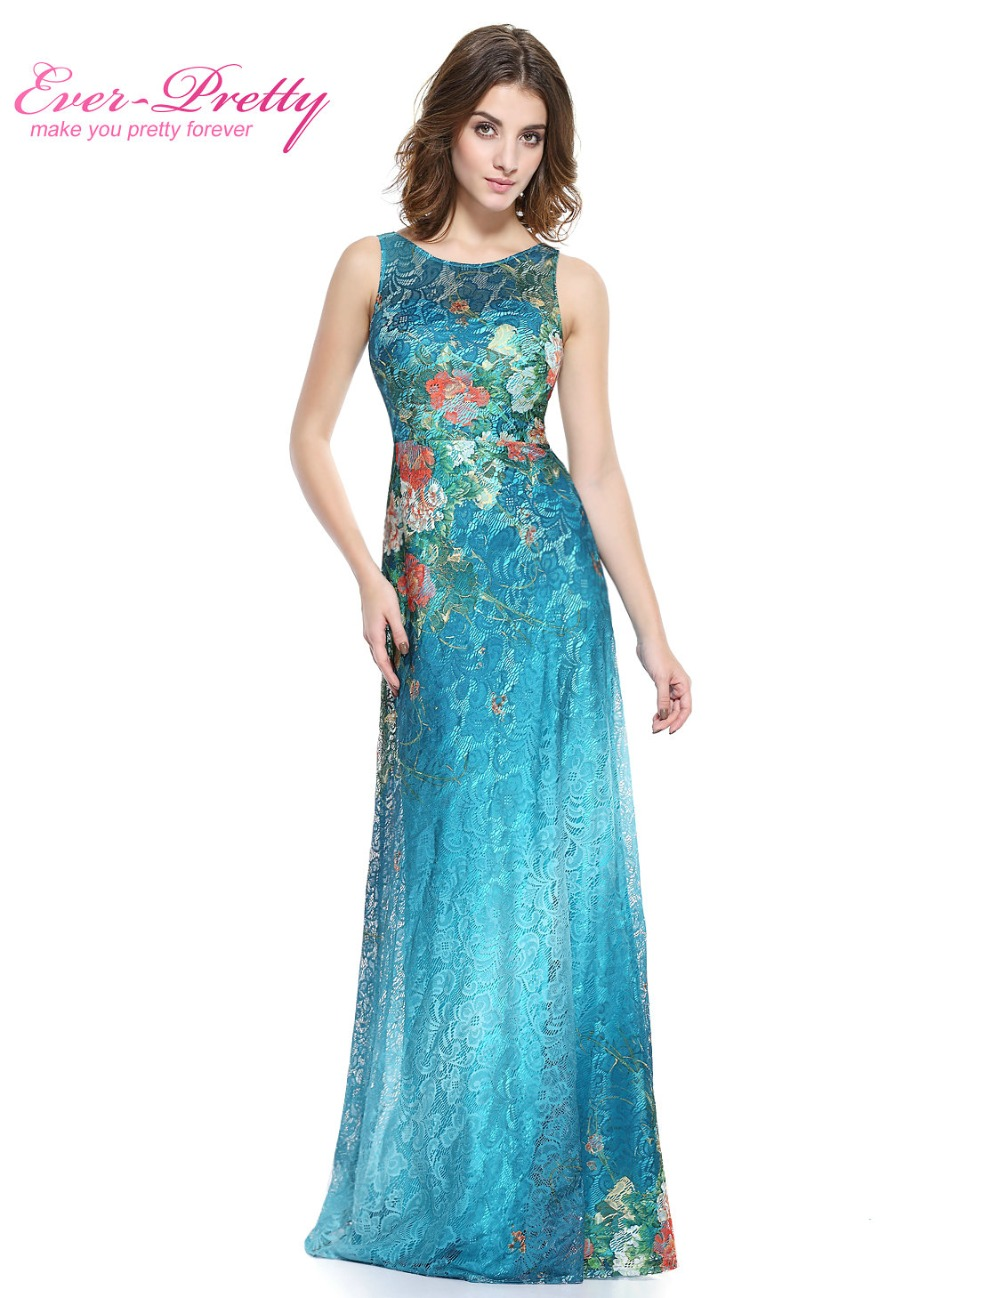 Homecoming Dress Patterns Vogue - Eligent Prom Dresses